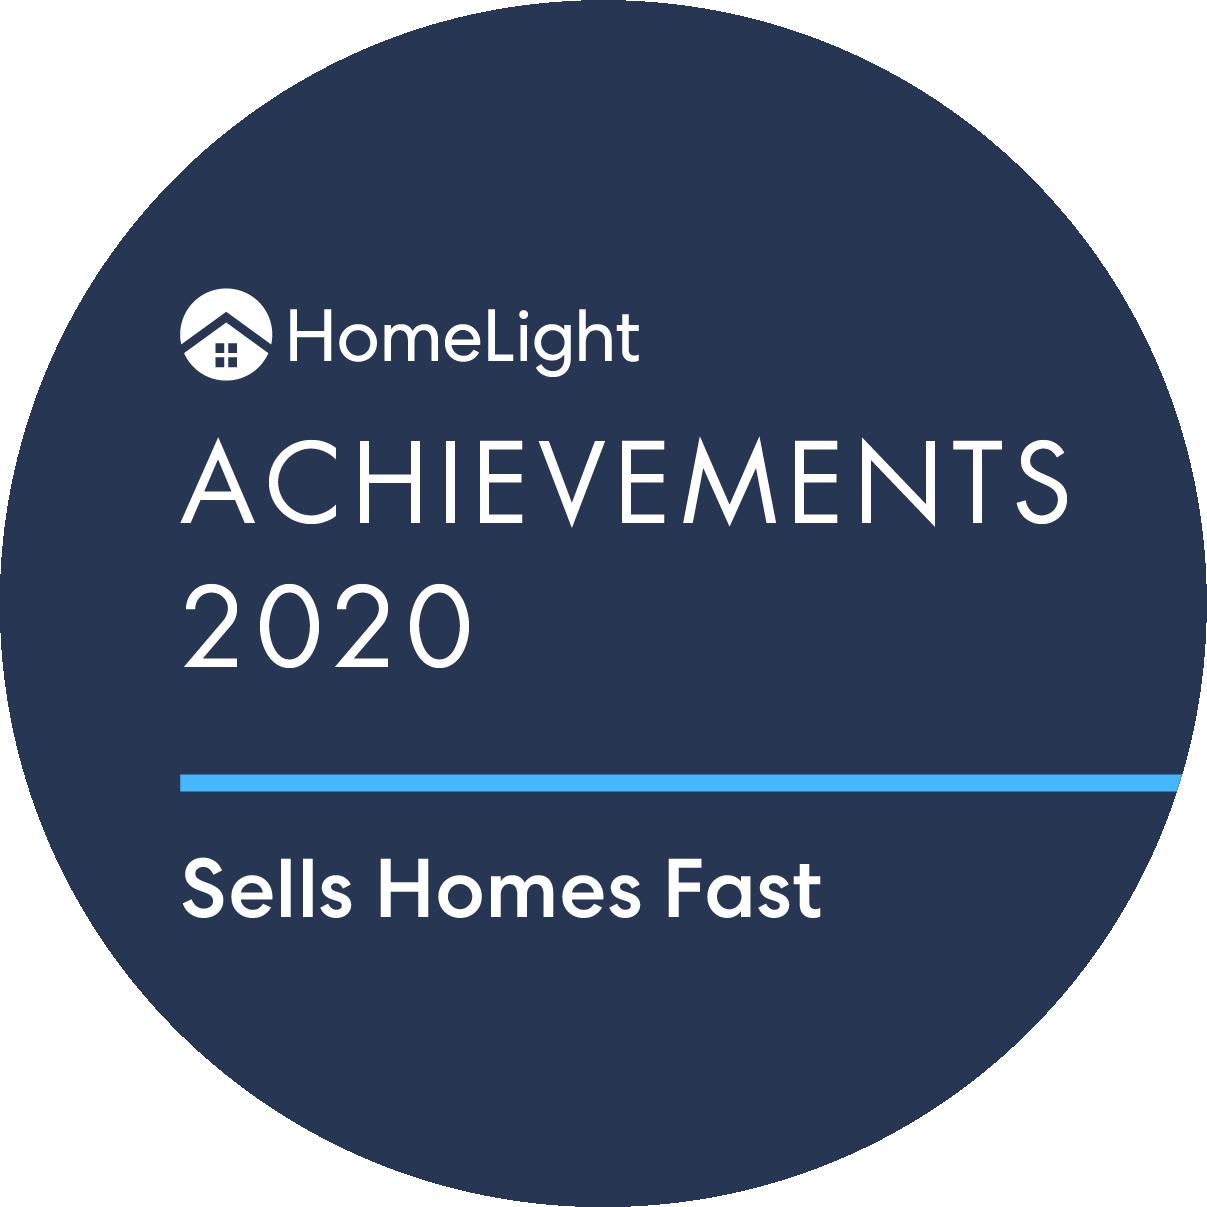 HomeLight Achievement Winner - Rebekah Sosa - Top North Carolina Real Estate Agent